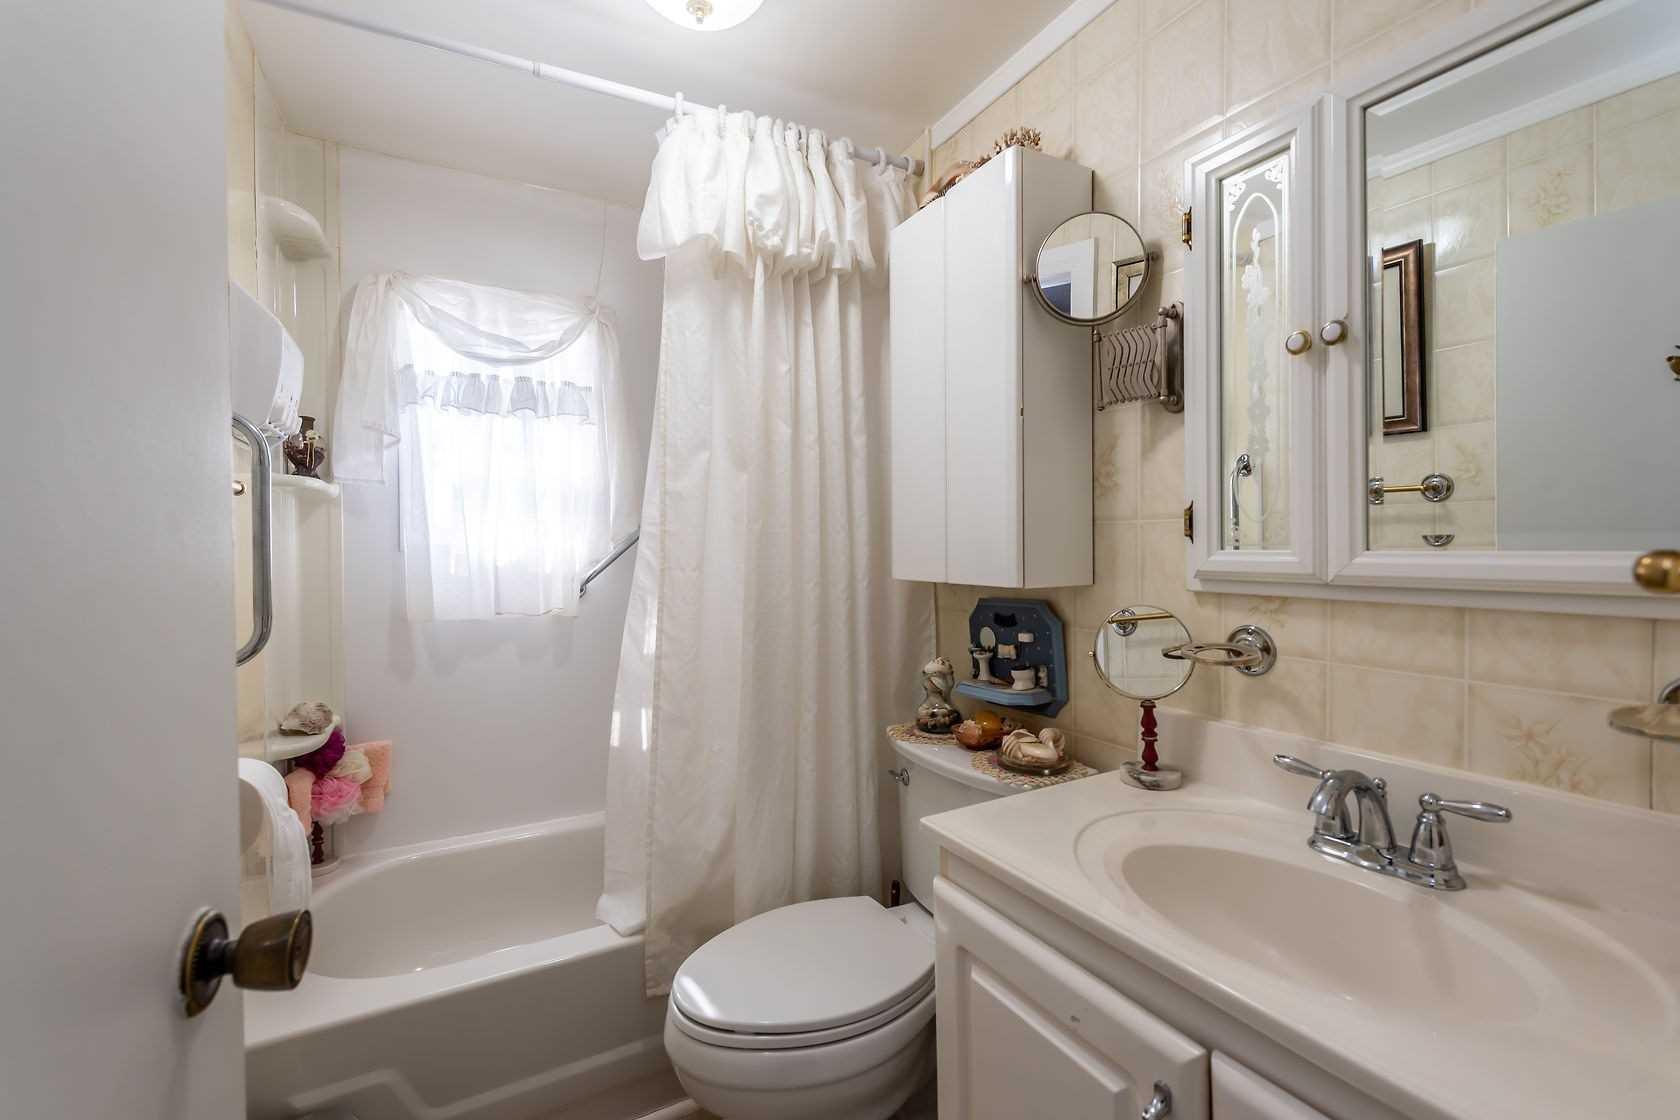 1185 Kohler Rd, Haldimand, Ontario N0A 1E0, 3 Bedrooms Bedrooms, ,1 BathroomBathrooms,Detached,For Sale,Kohler,X5143902